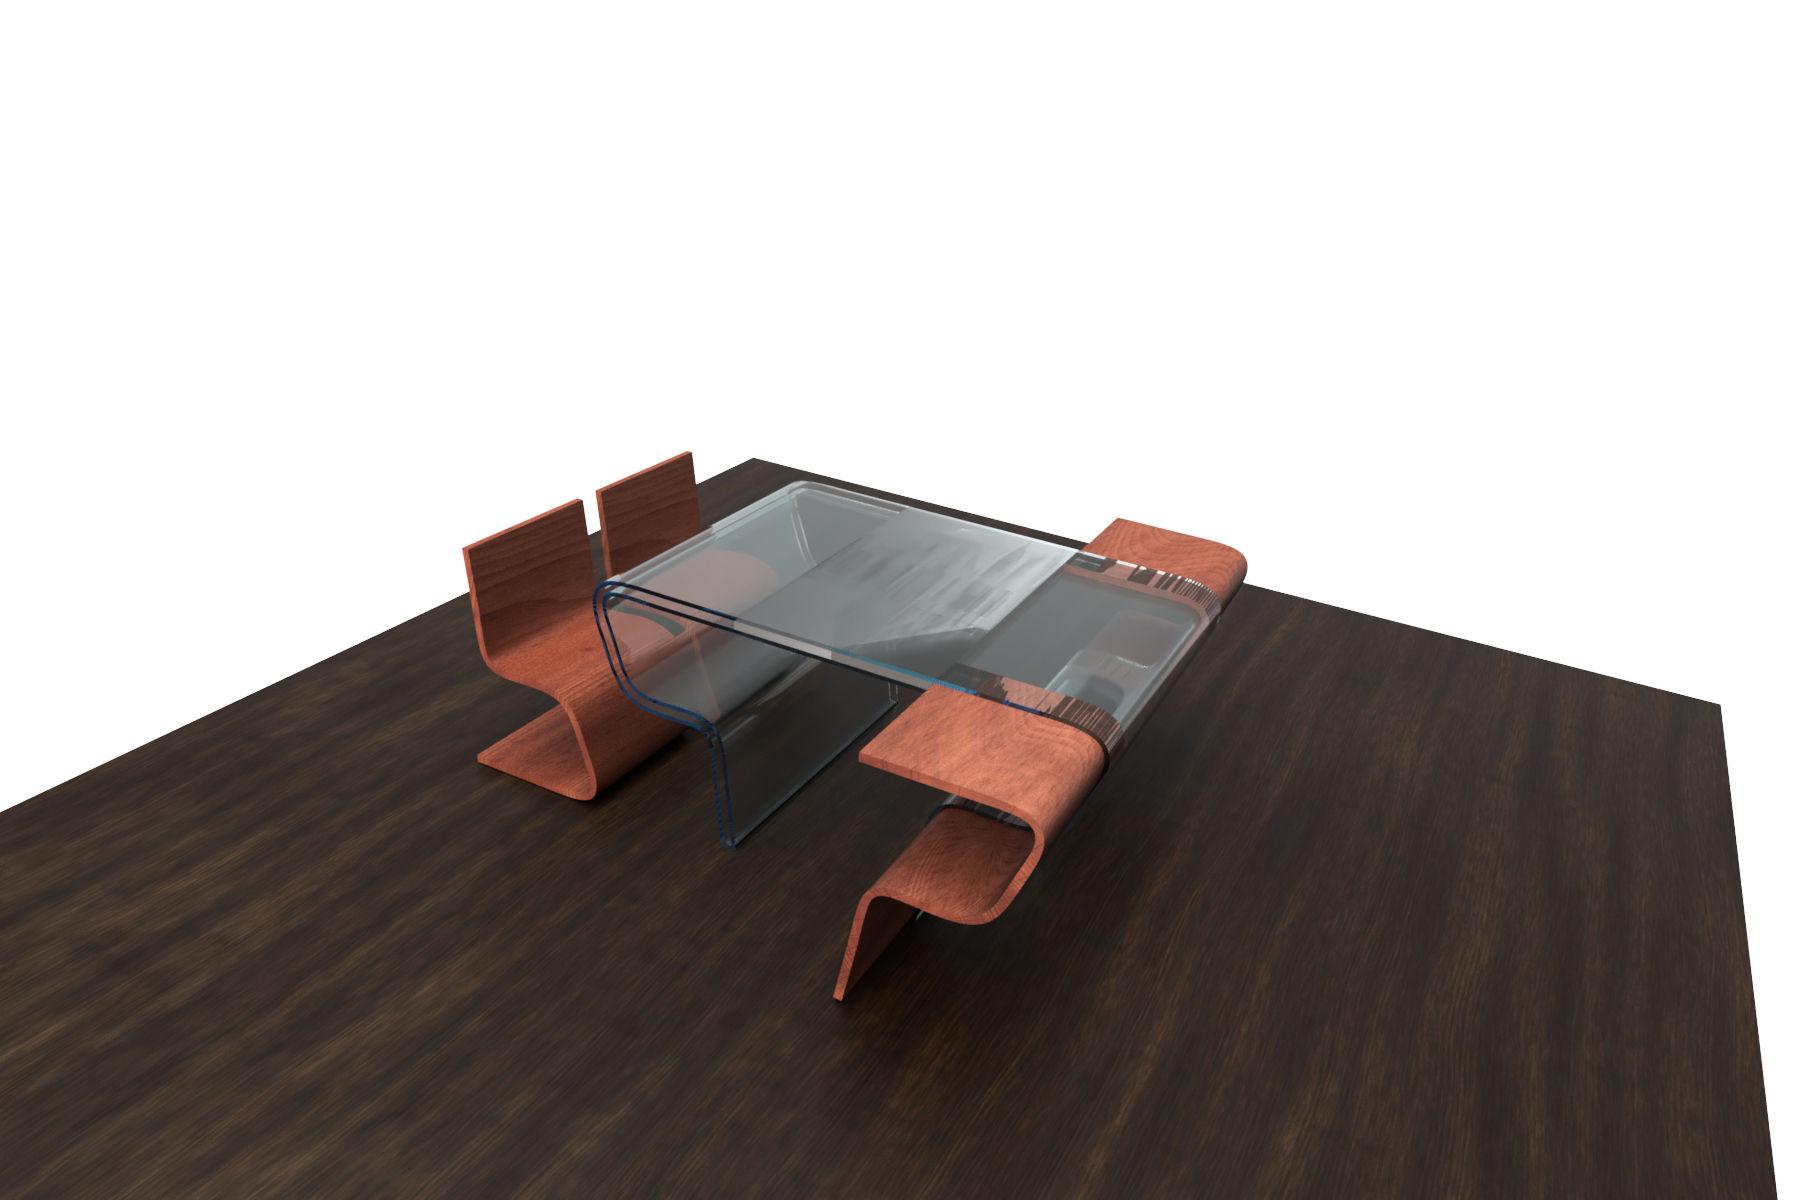 Designchallengefurniture-2016-aug-29-06-06-28pm-000-customizedview12945597395-3500-3500